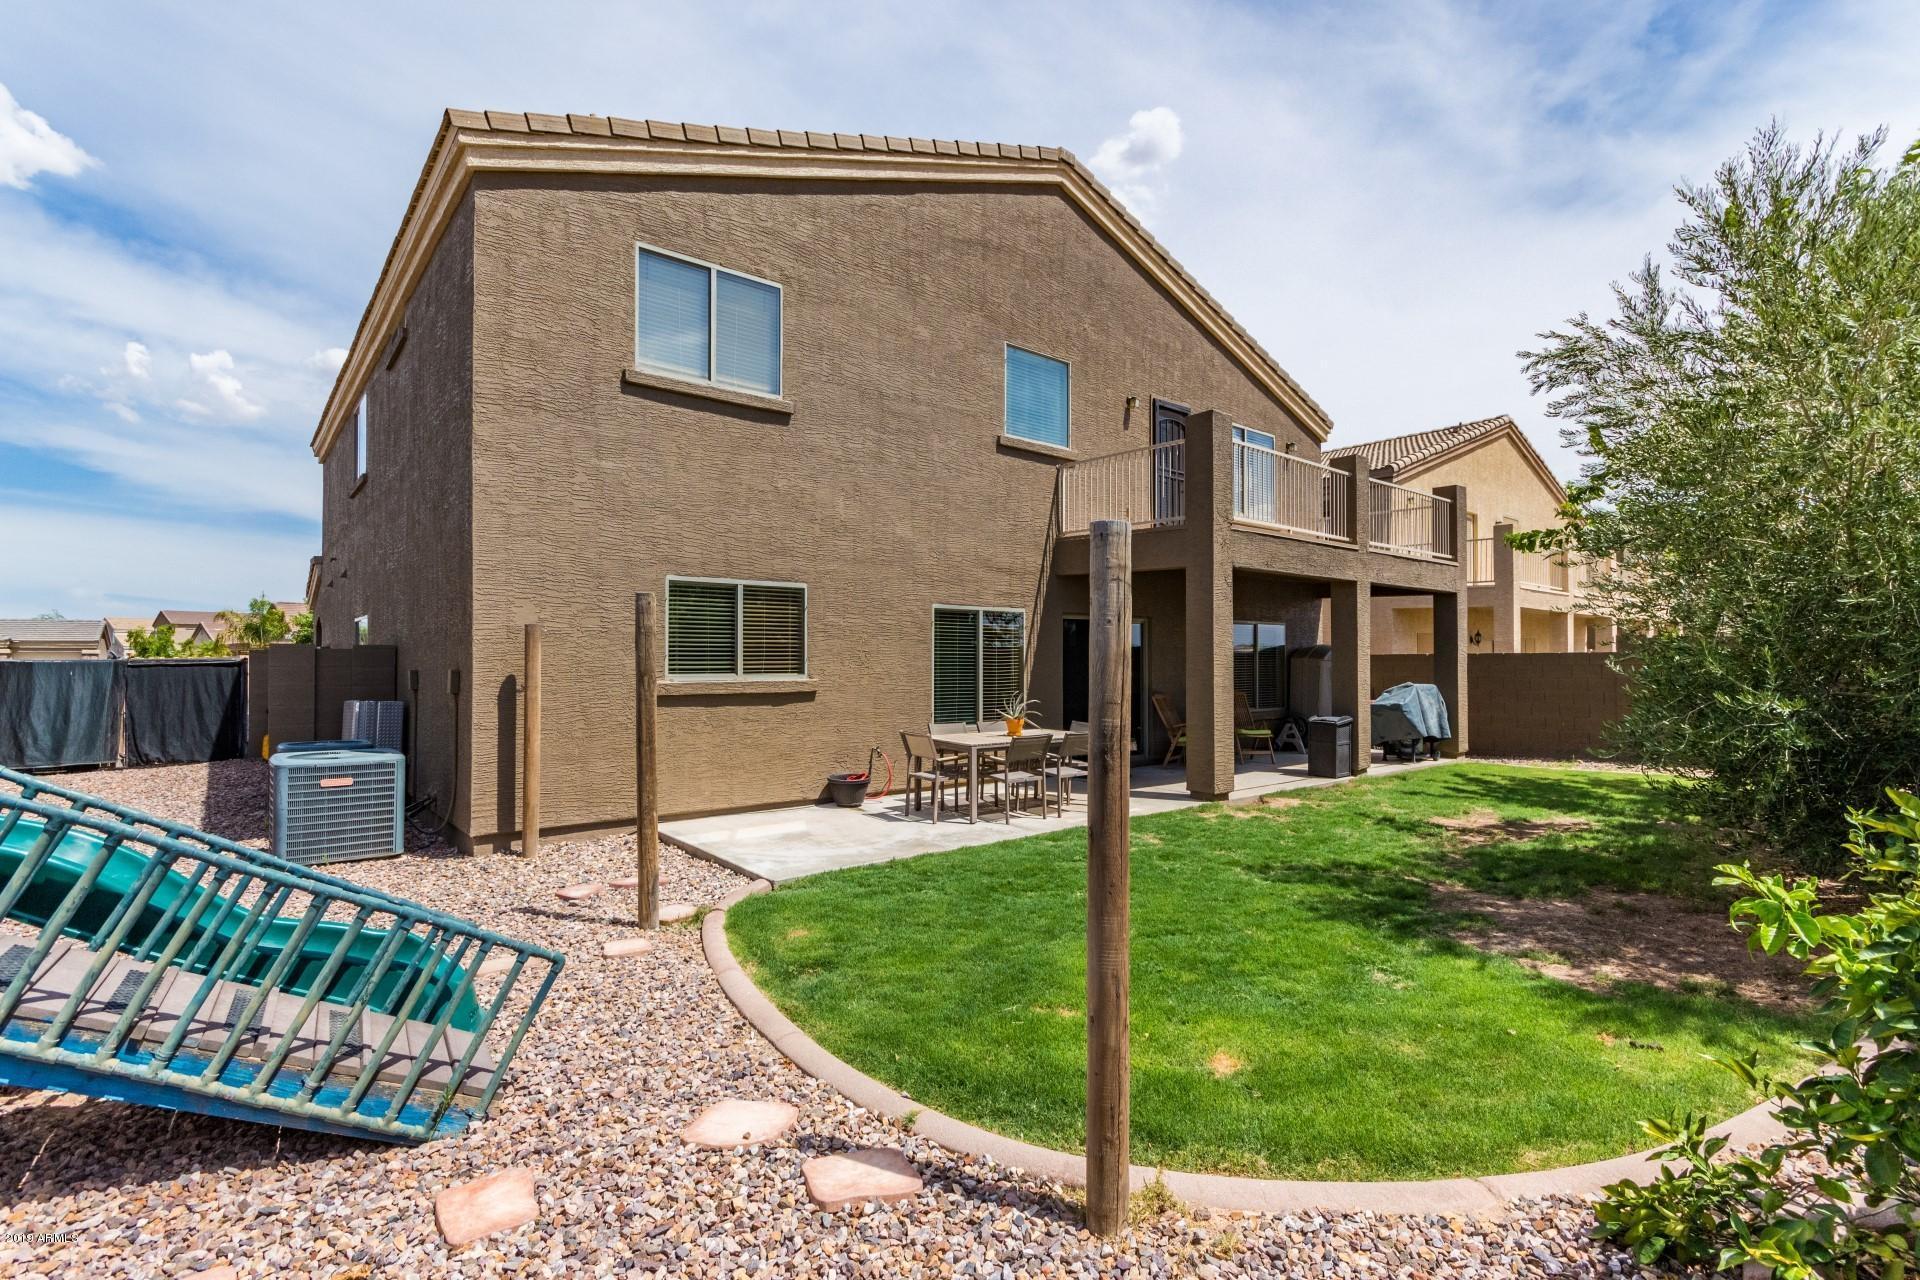 MLS 5960571 2265 N MAGDELENA Place, Casa Grande, AZ 85122 Casa Grande AZ Mission Valley